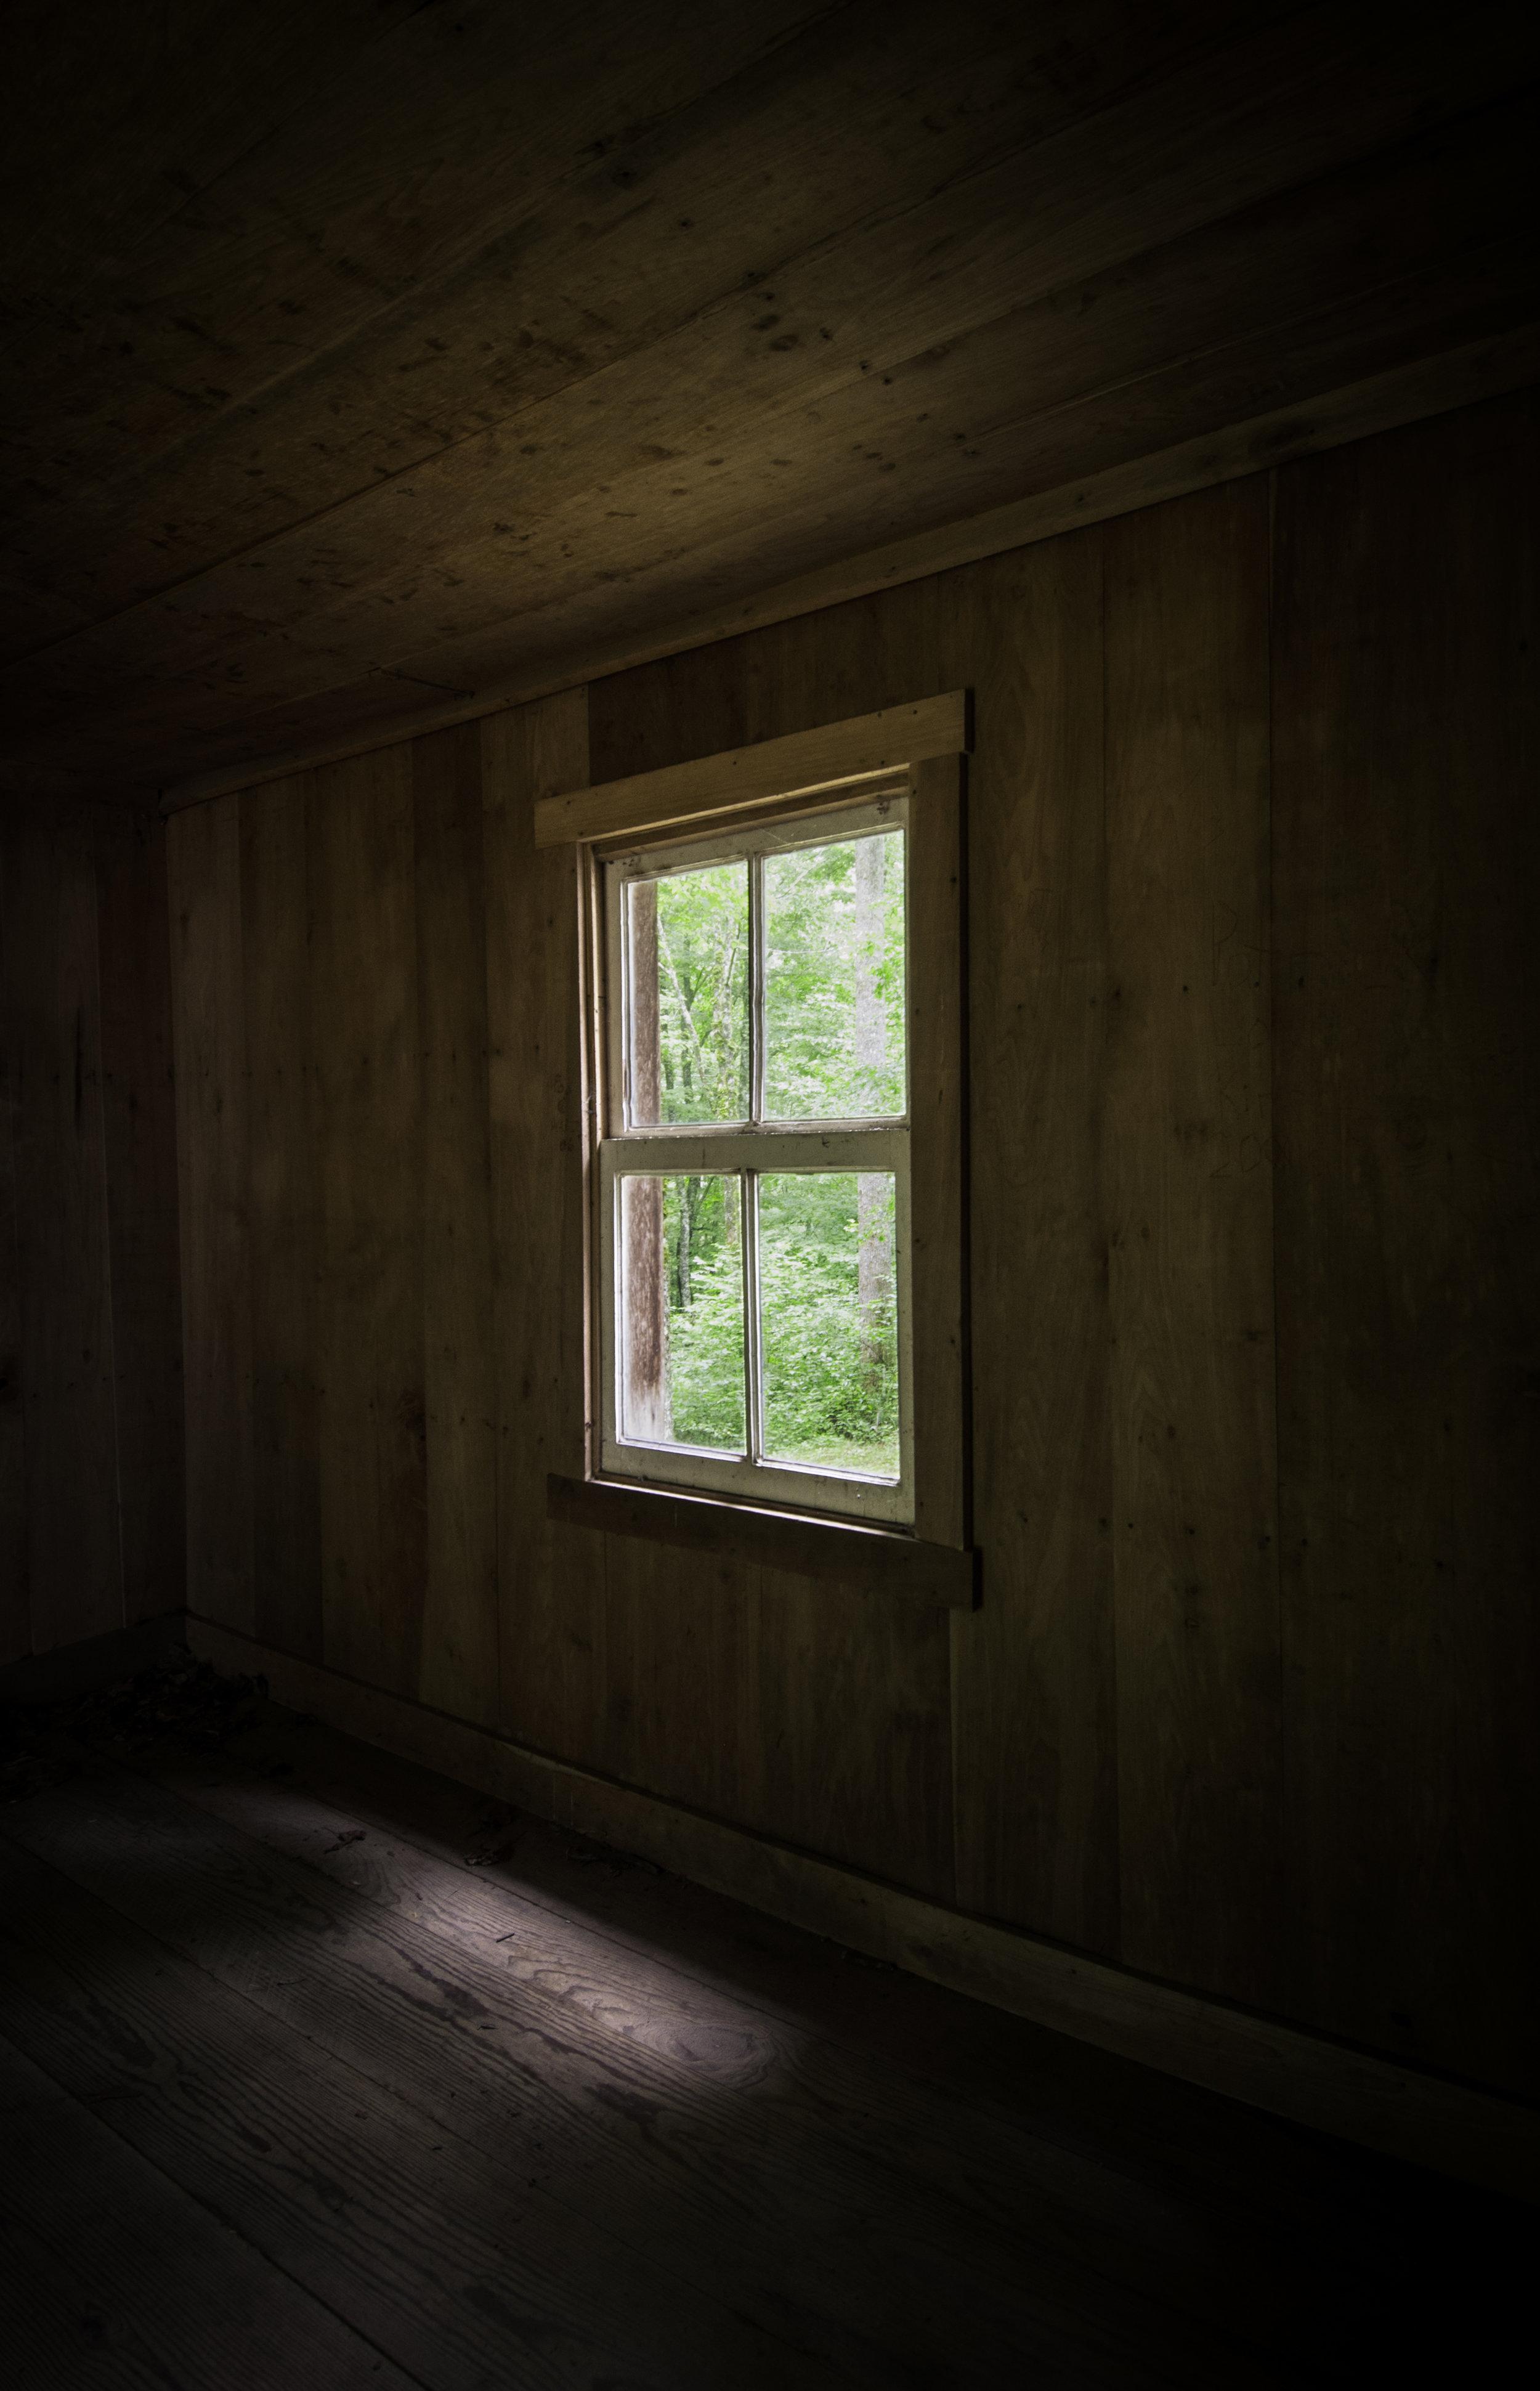 Urban_window002.jpg